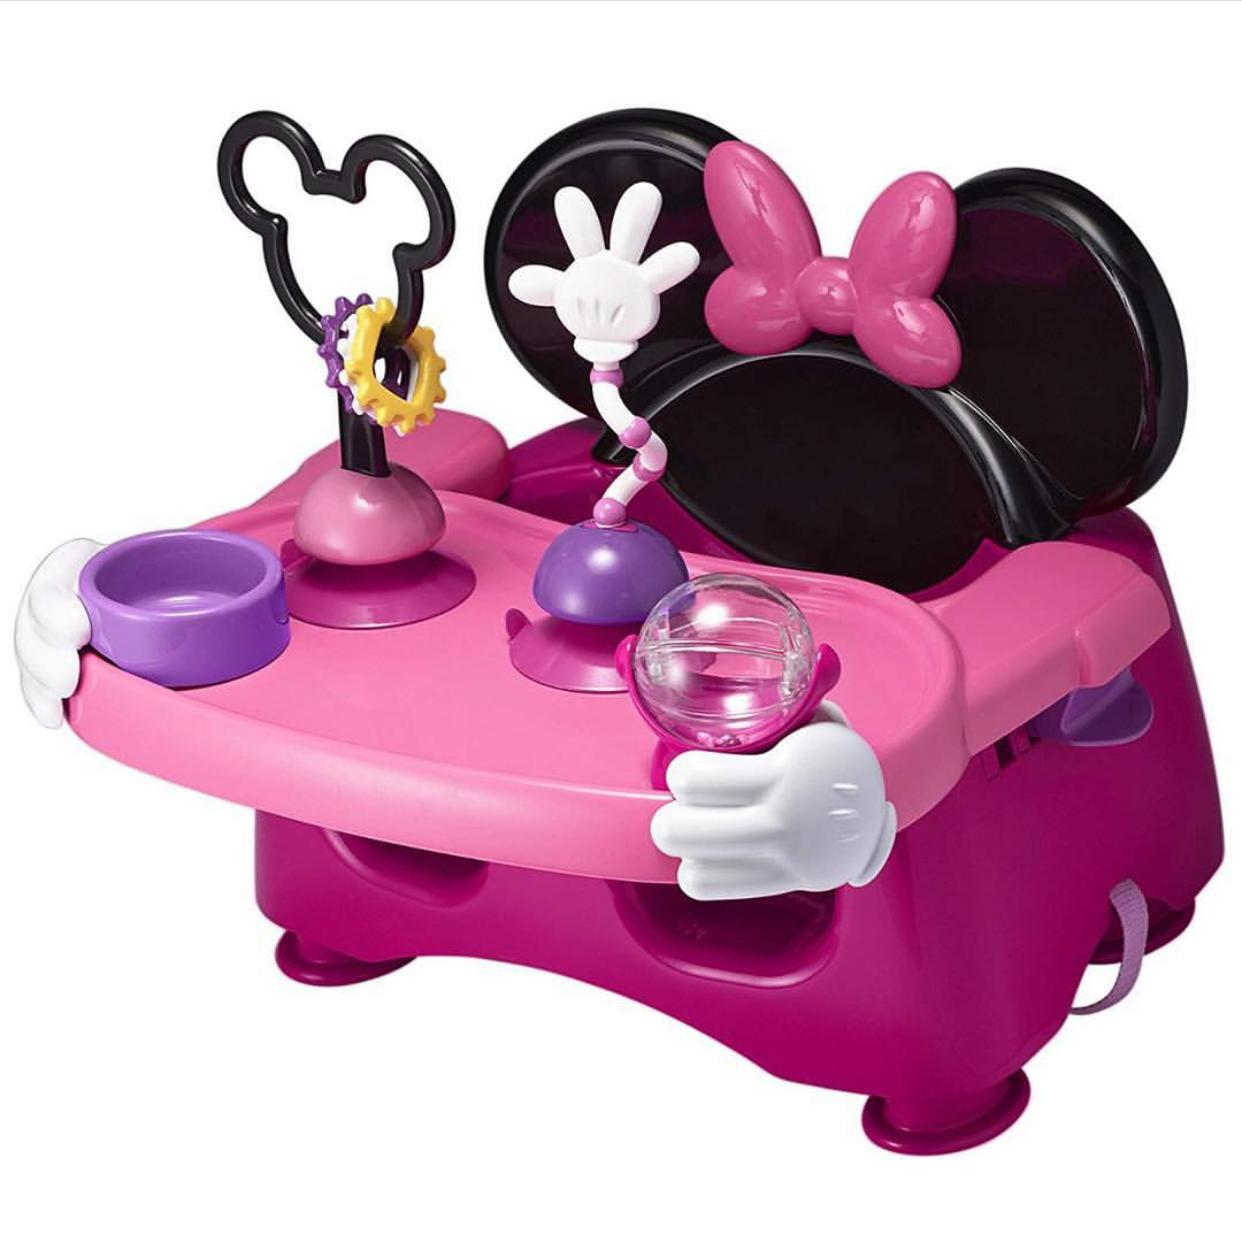 Silla 2 en 1 Disney Minnie Mouse